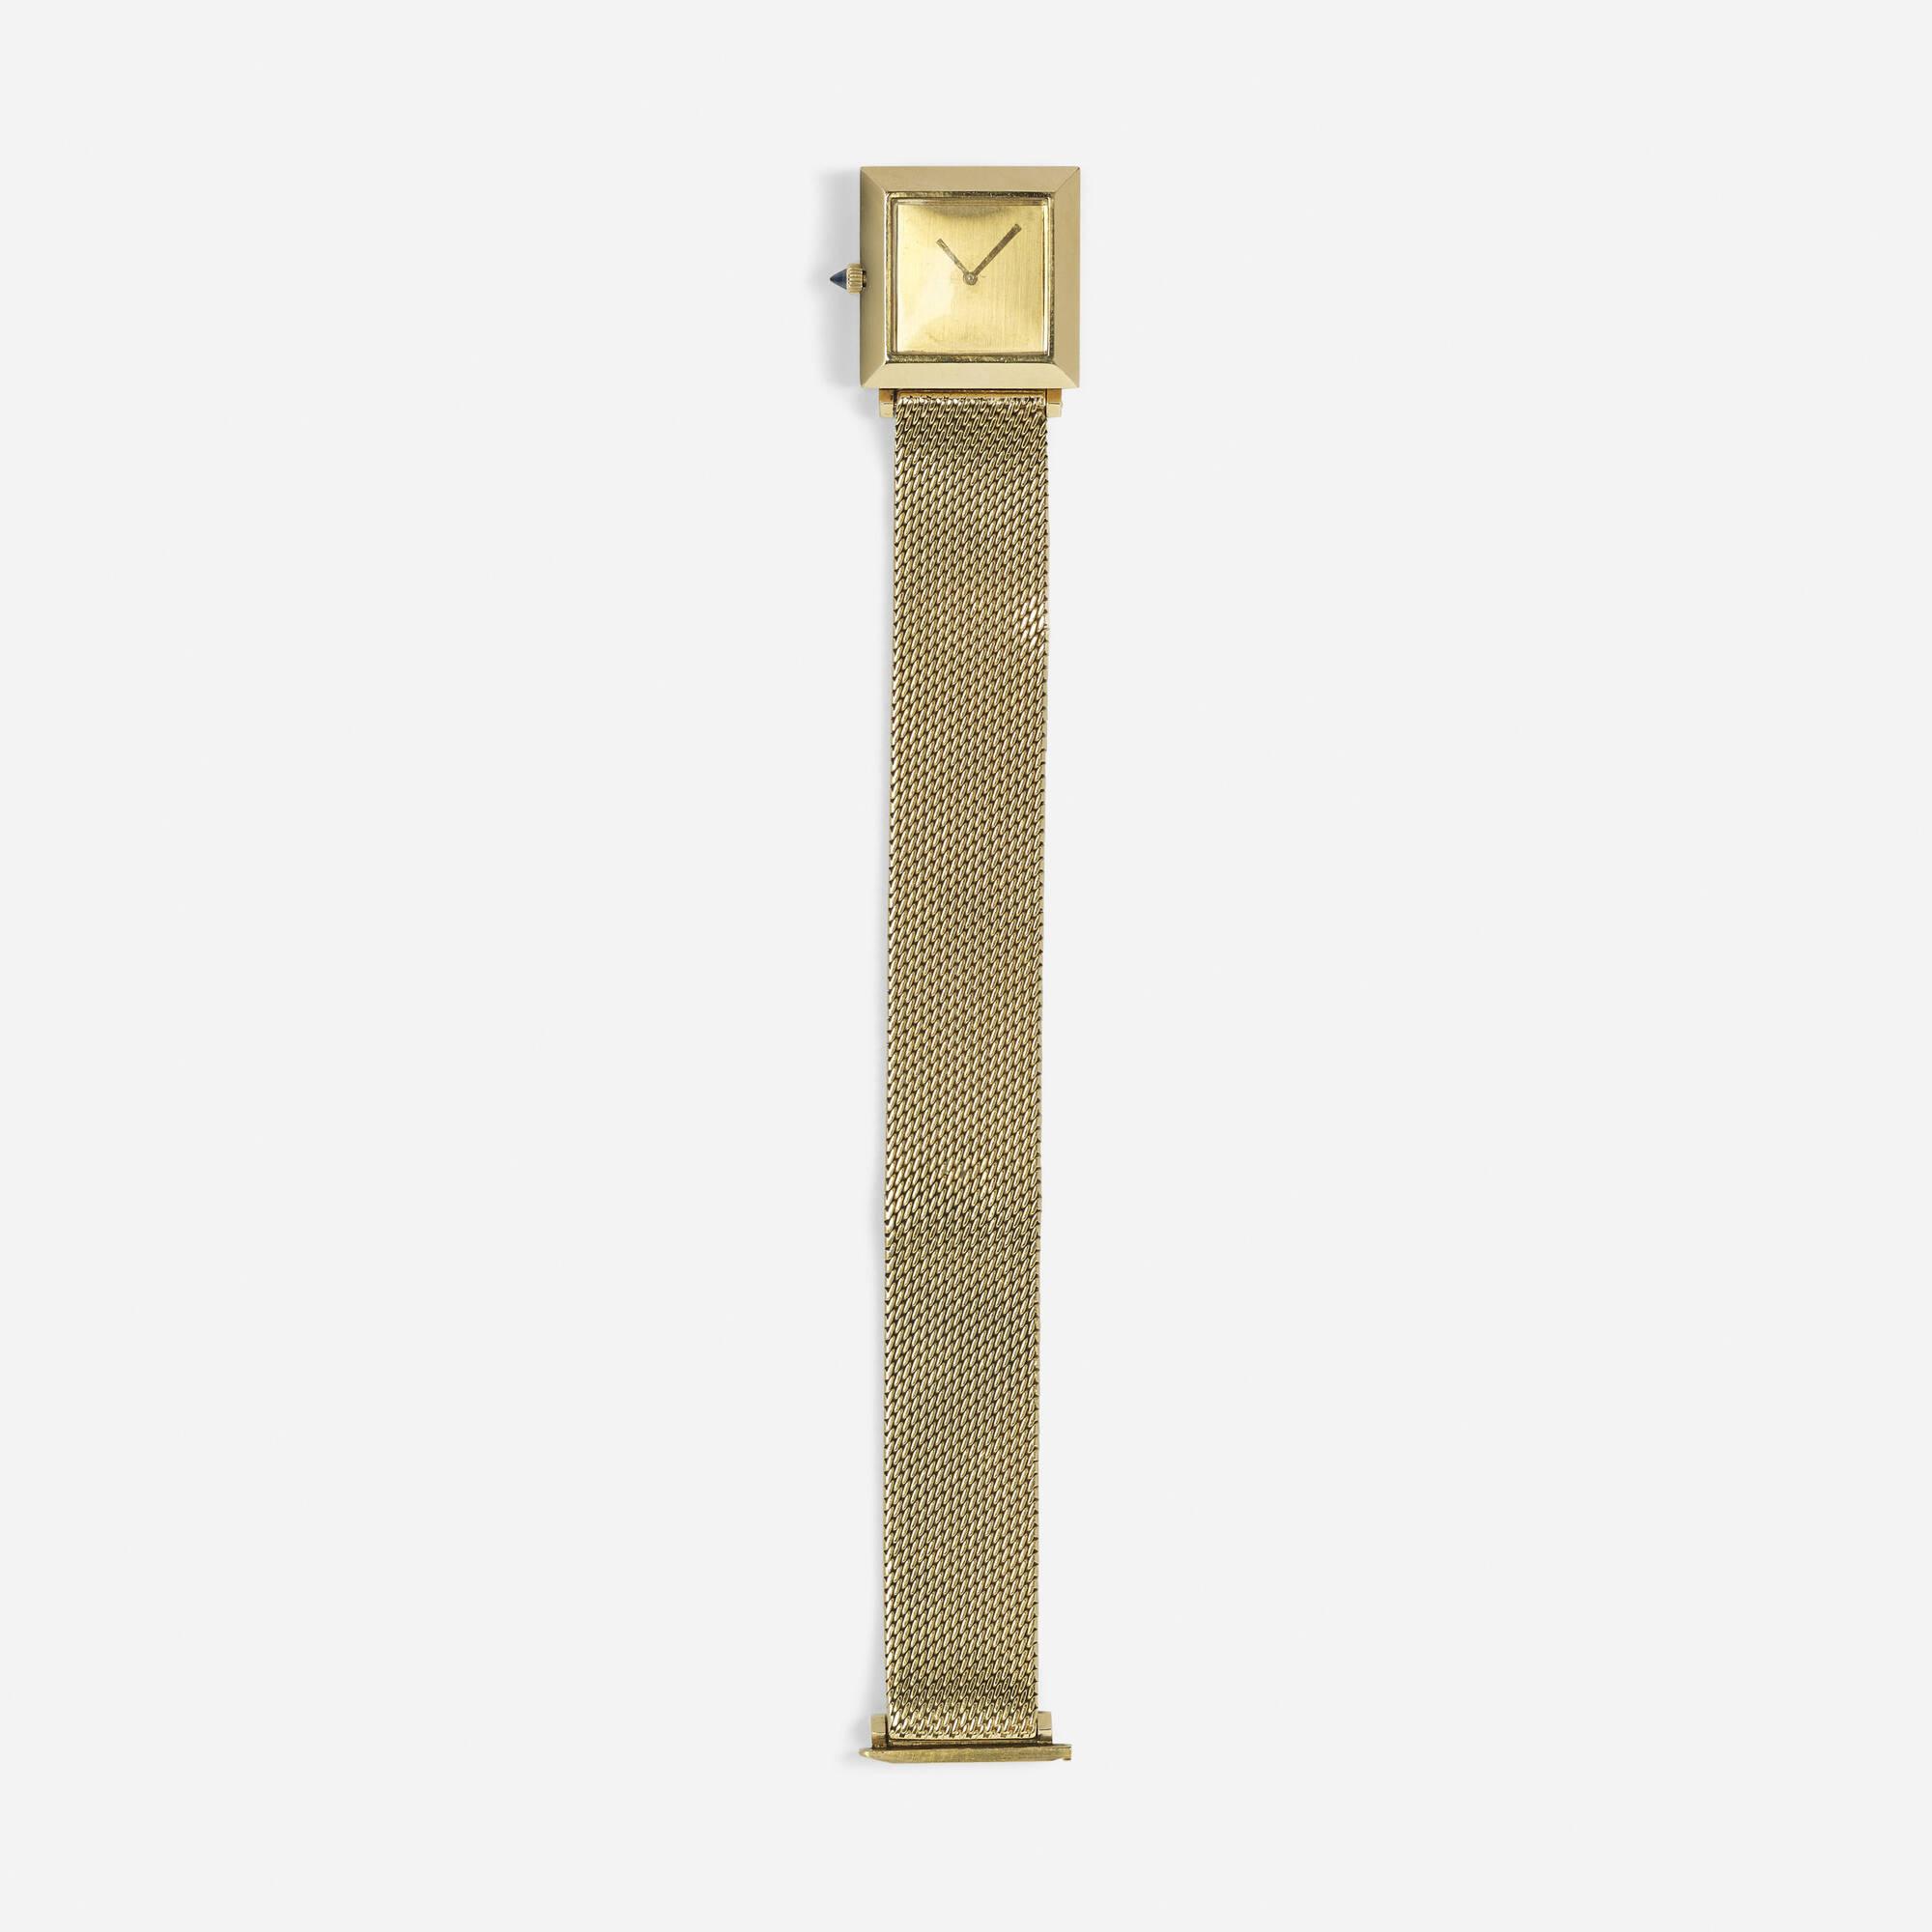 266: Boucheron / A gold ladies wristwatch (1 of 1)